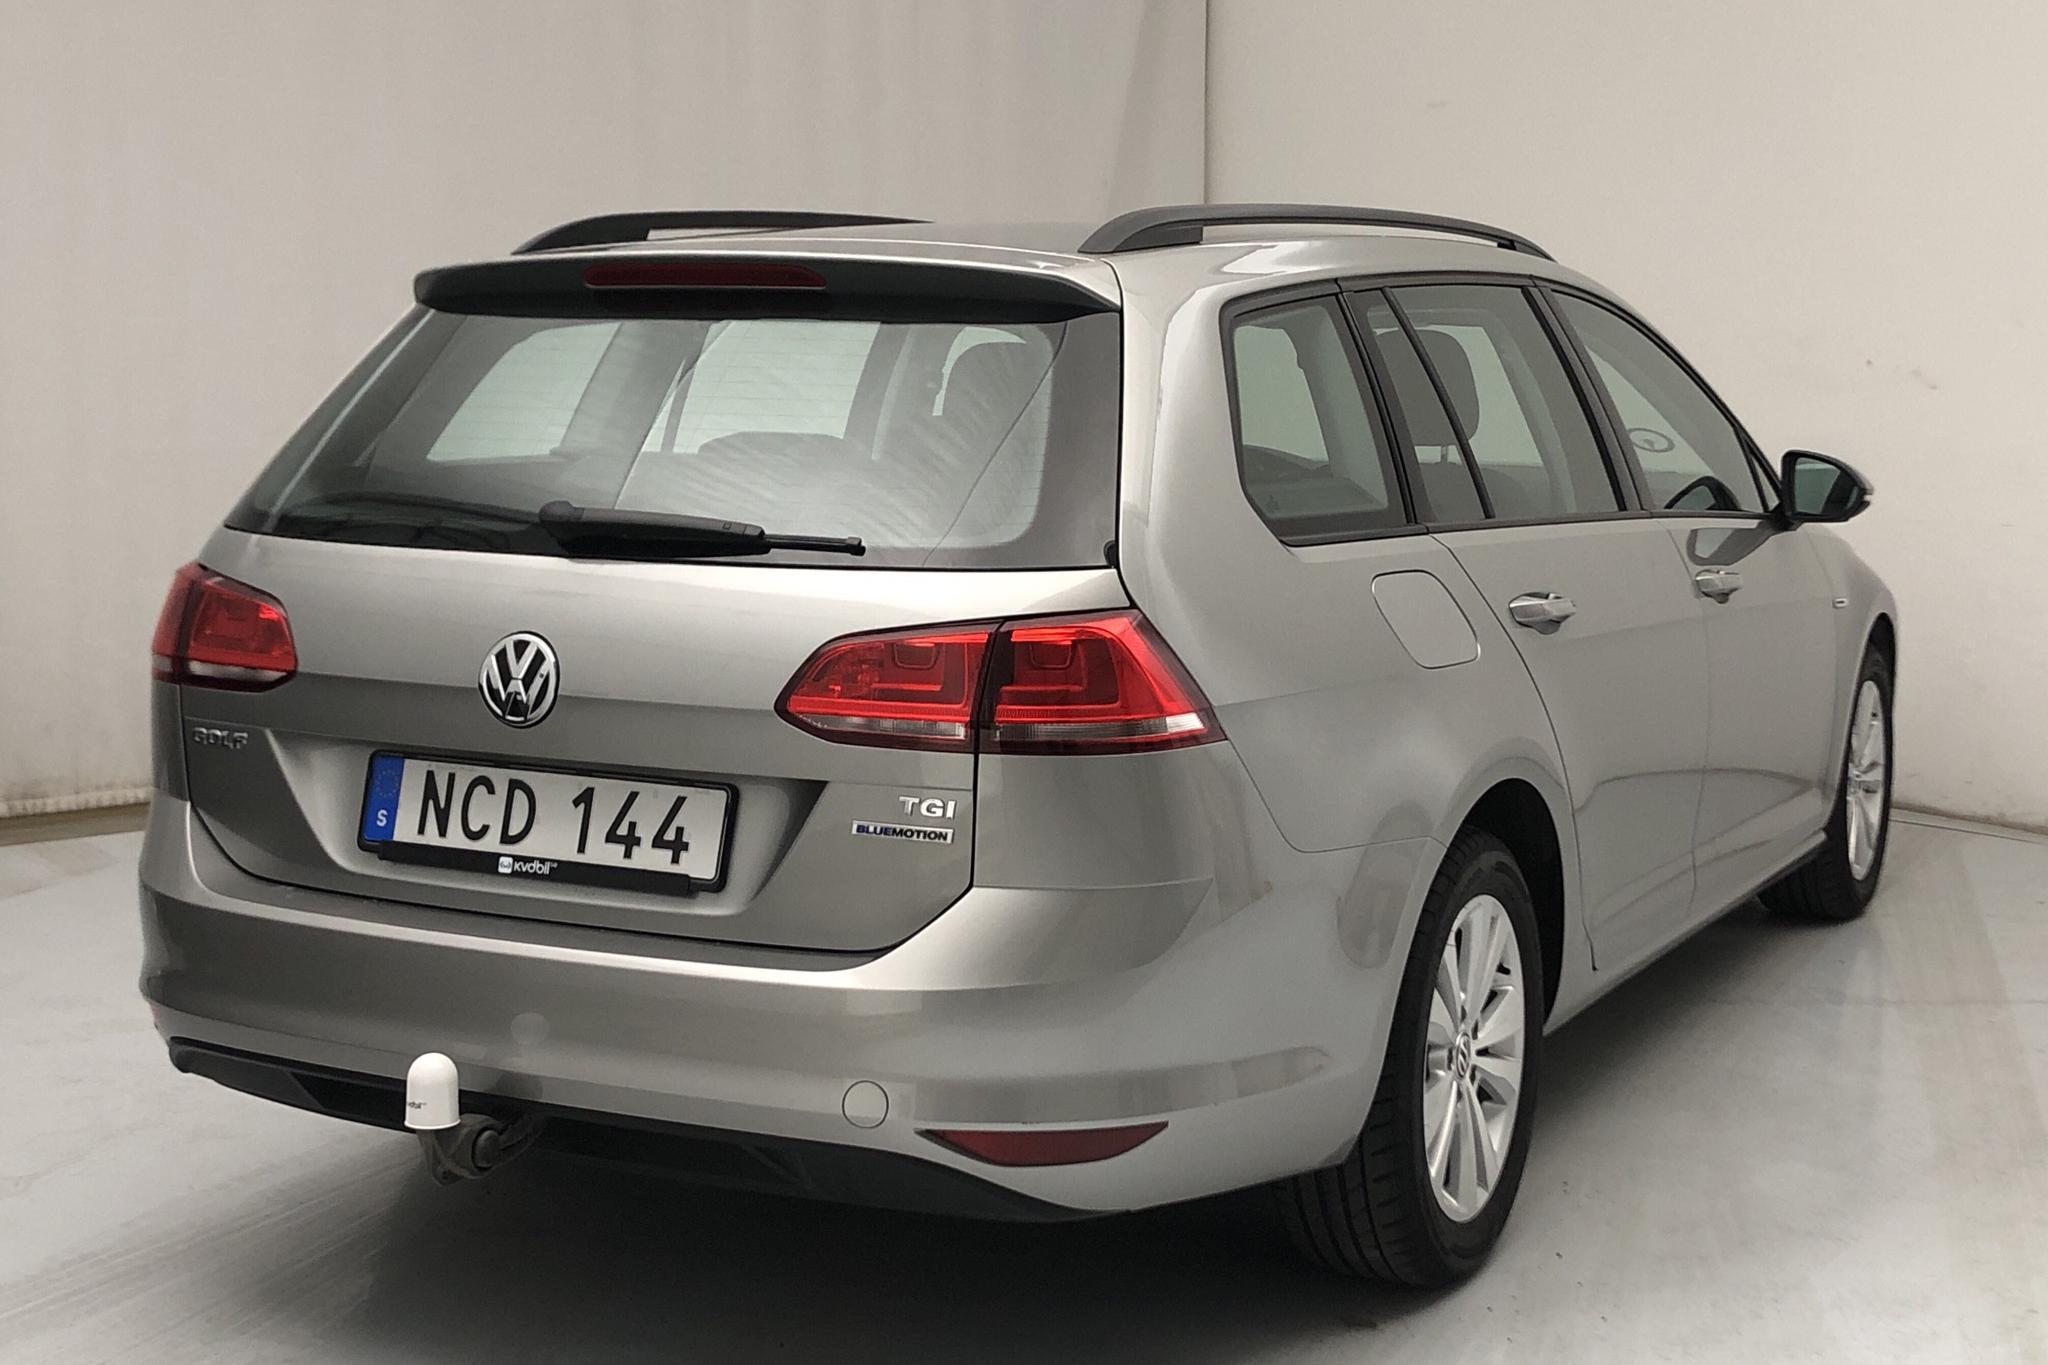 VW Golf VII 1.4 TGI BlueMotion Sportscombi (110hk) - 3 445 mil - Manuell - silver - 2016